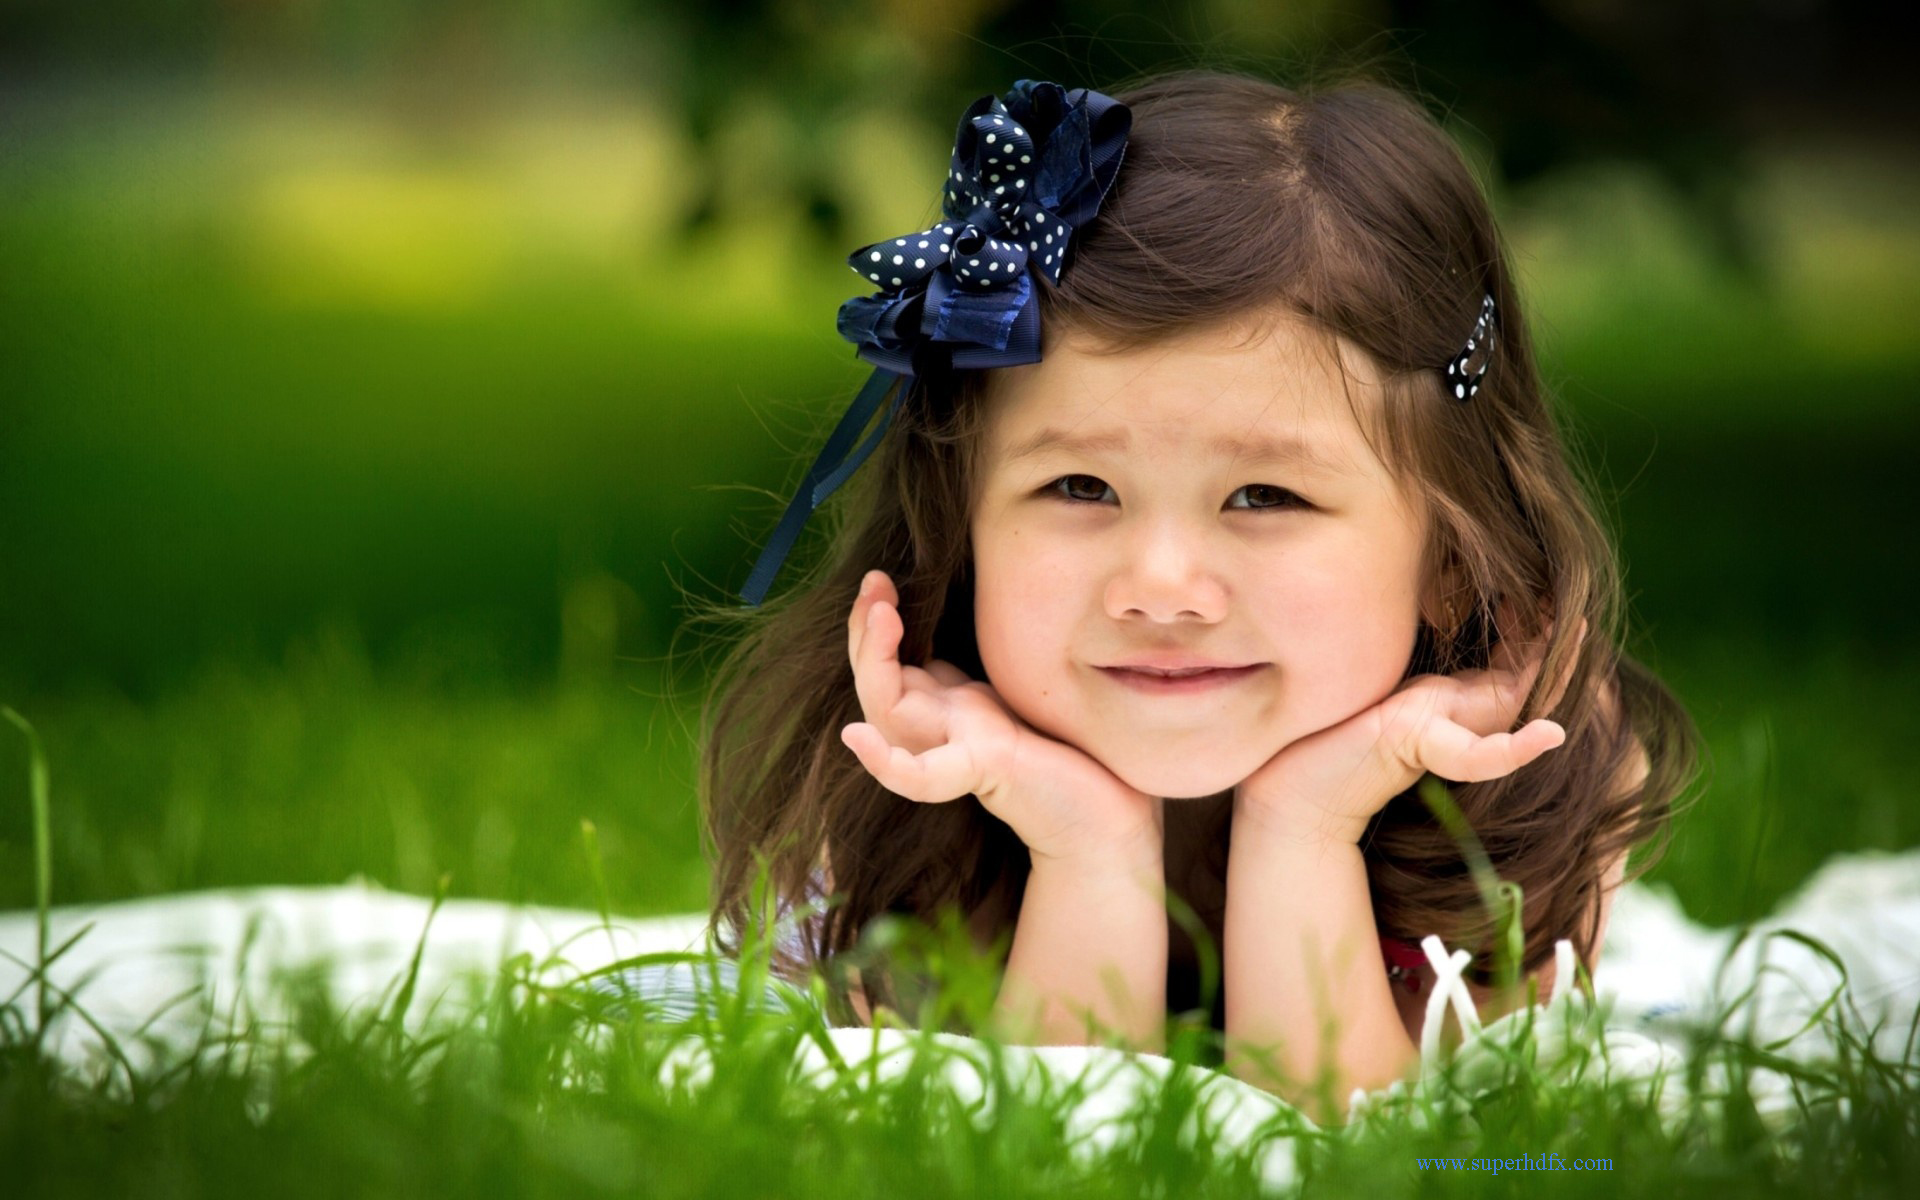 اجمل خلفيات اطفال بنات